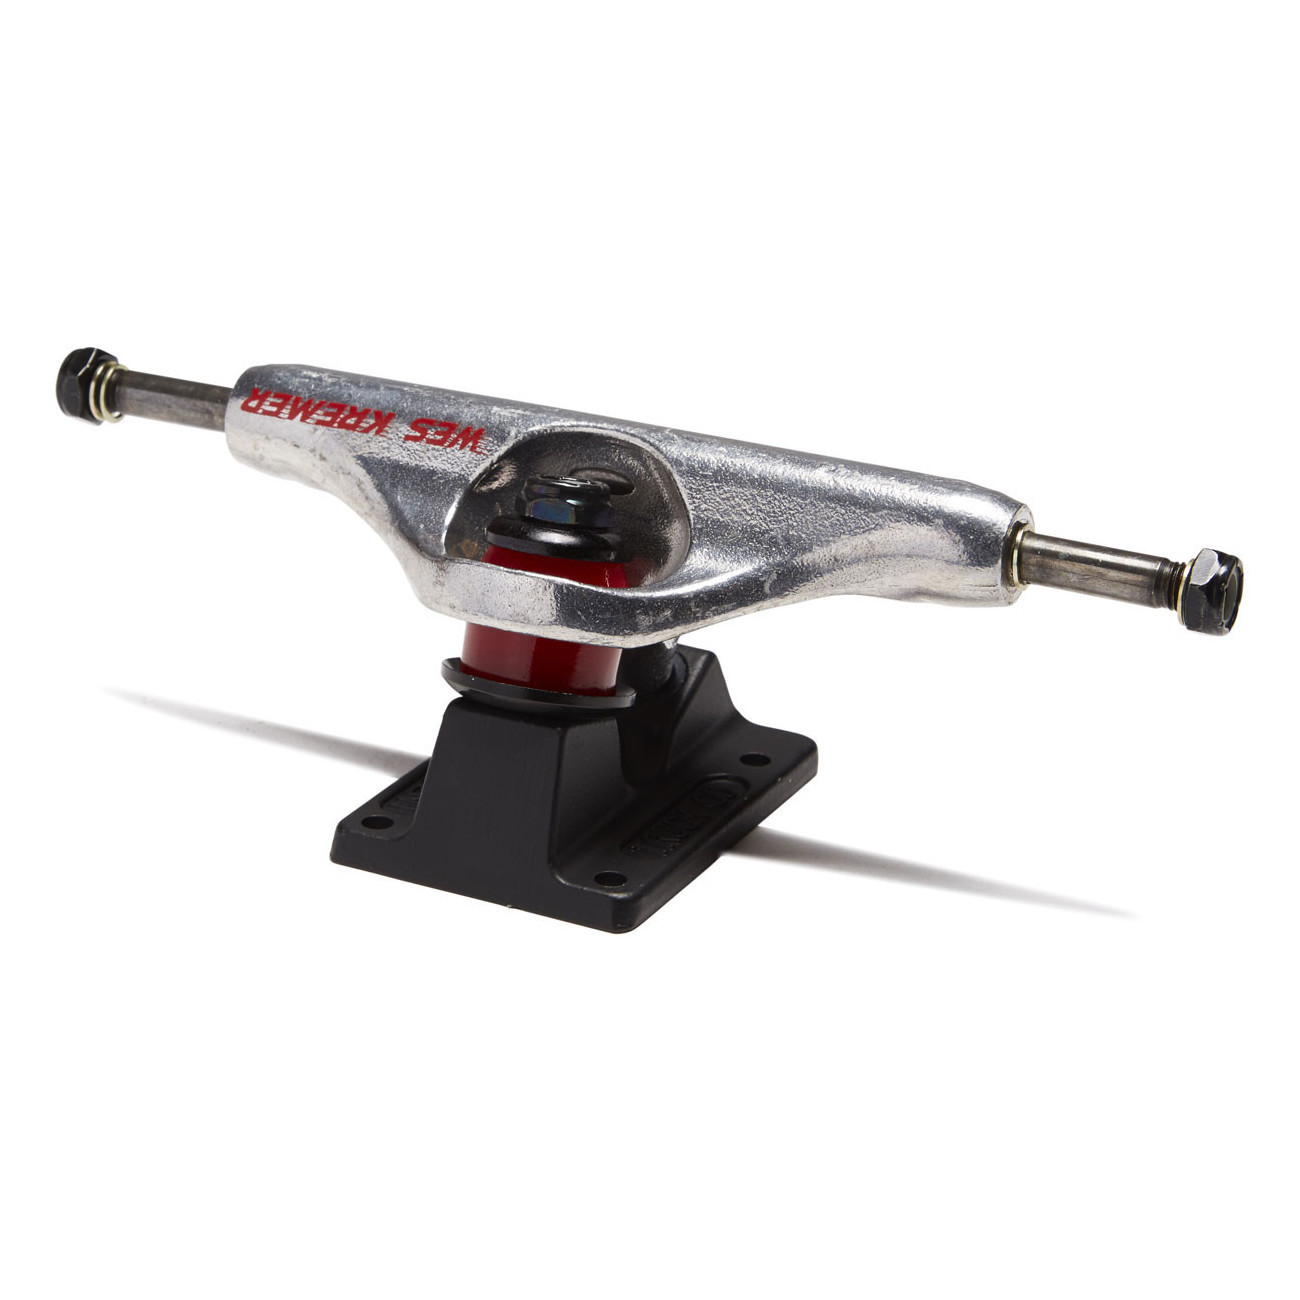 Подвески для скейтборда INDEPENDENT Stage 11 Hollow Wes Kremer Speed Two Standard (Silver/Matte Black)